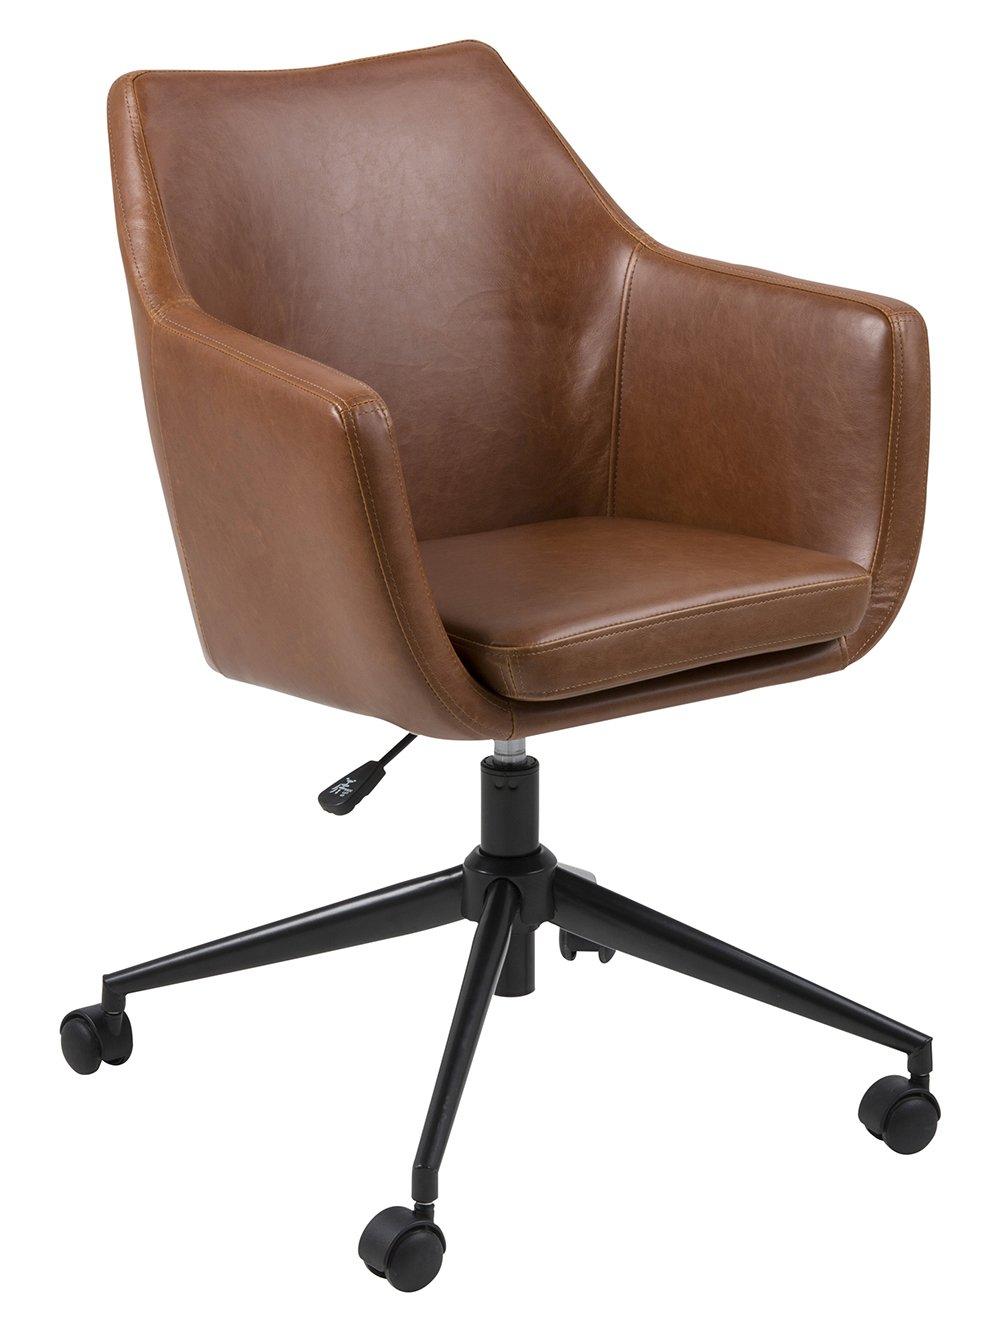 AC Design Furniture Bürostuhl Trine, B  58 x T 58 x H  95 cm, Metall, Braun